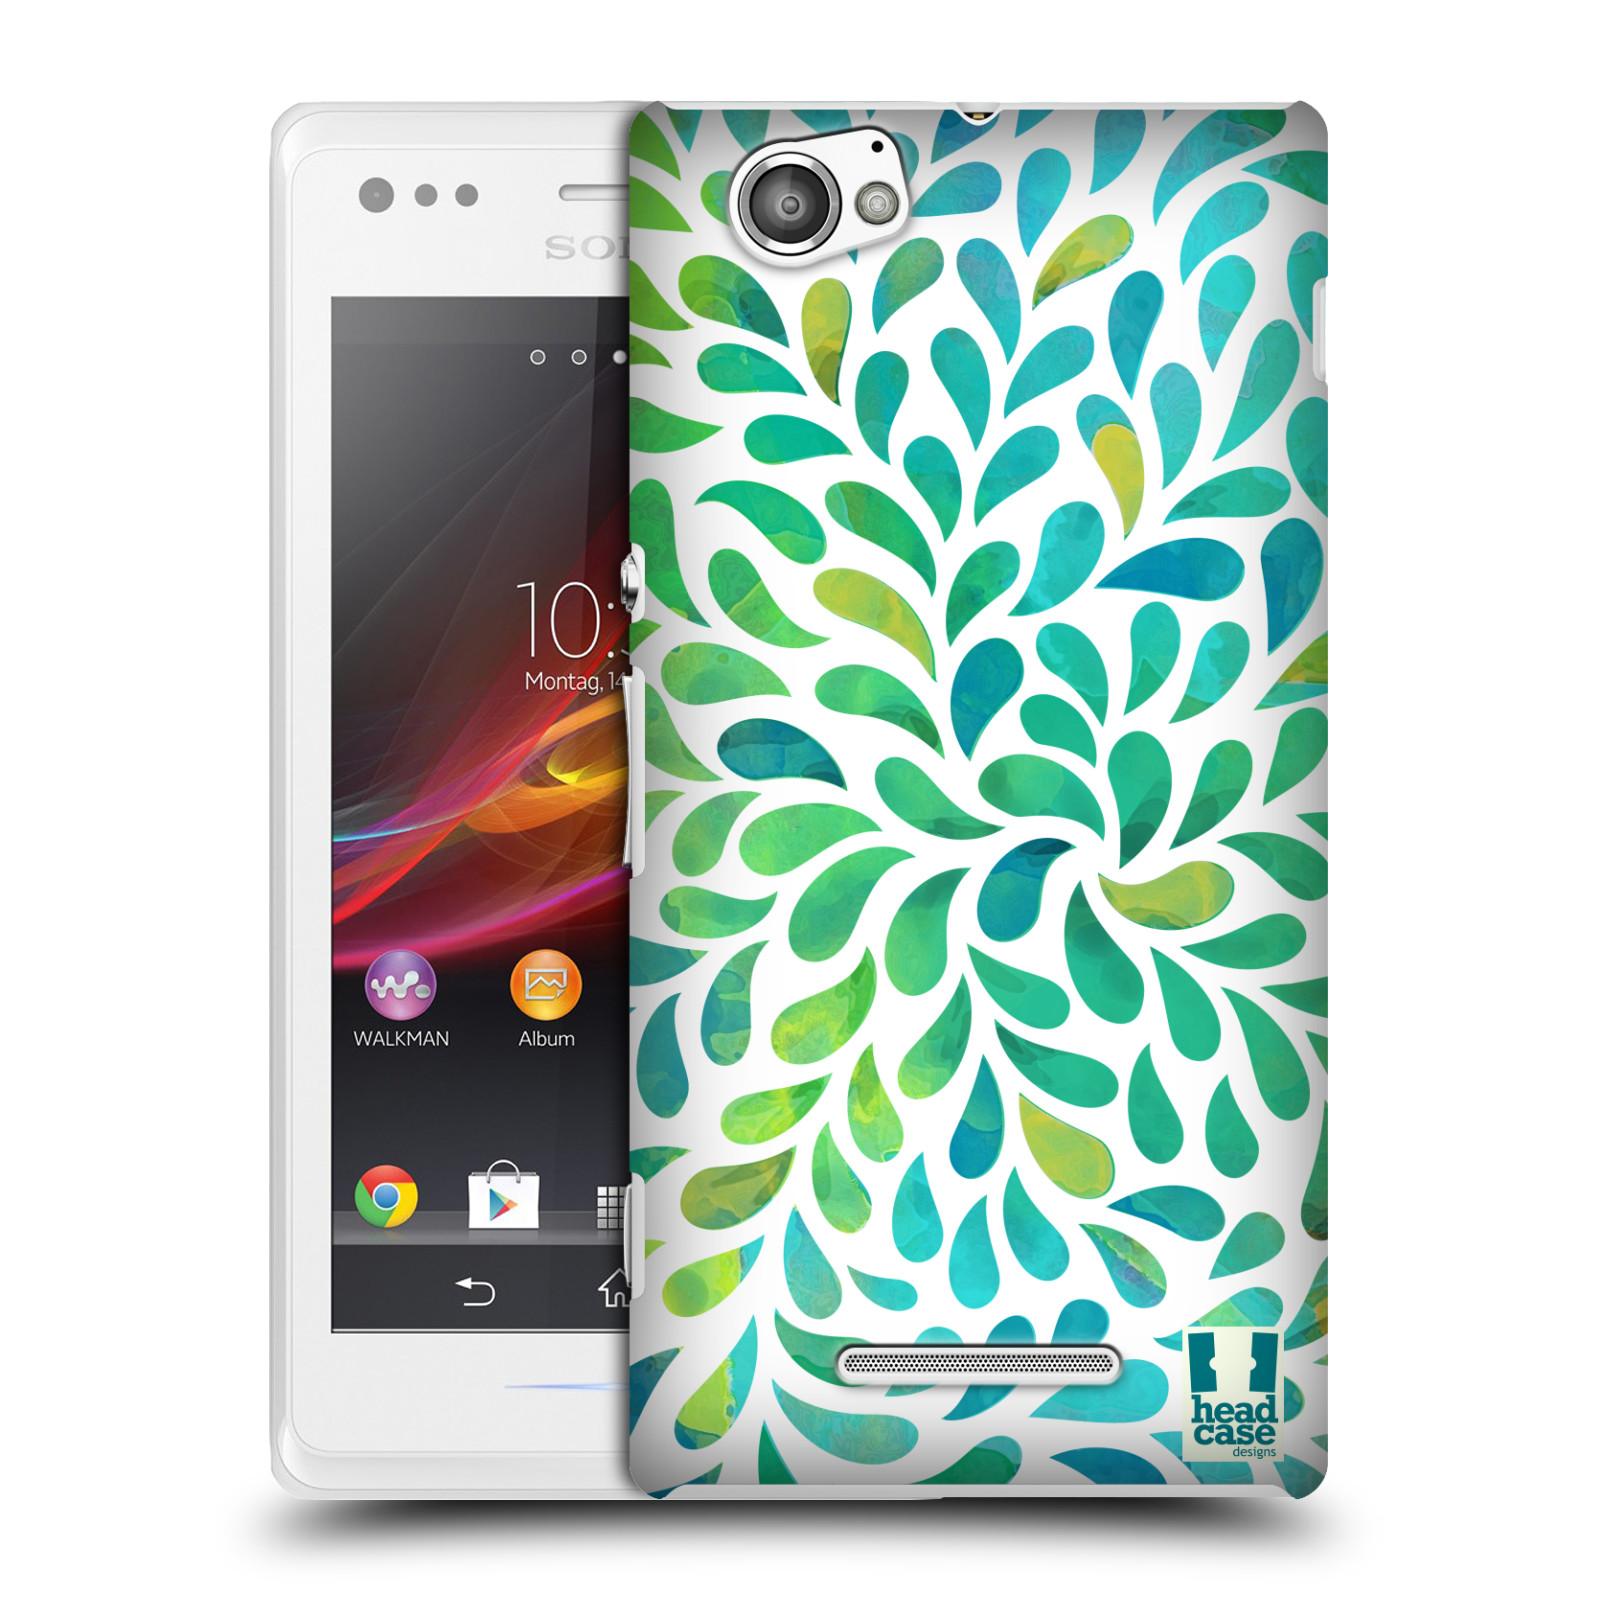 Plastové pouzdro na mobil Sony Xperia M C1905 HEAD CASE Droplet Wave Kapičky (Kryt či obal na mobilní telefon Sony Xperia M )